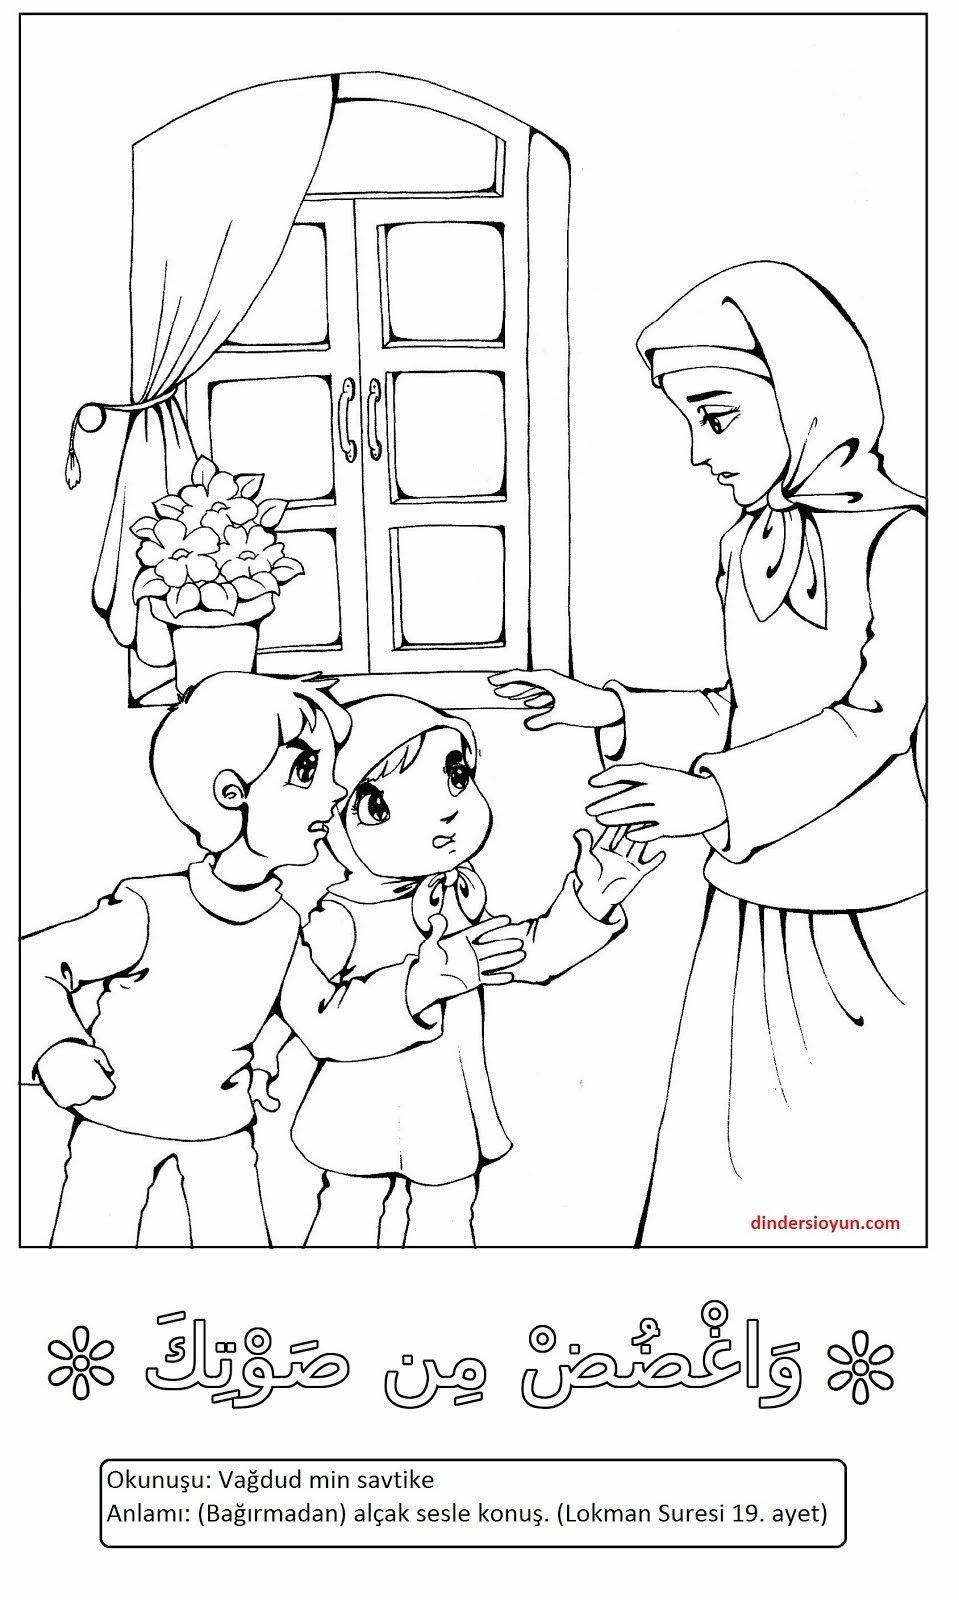 Pin By Lamya Otmane On روضة اطفال Islamic Kids Activities Islam For Kids Islamic Kids Craft